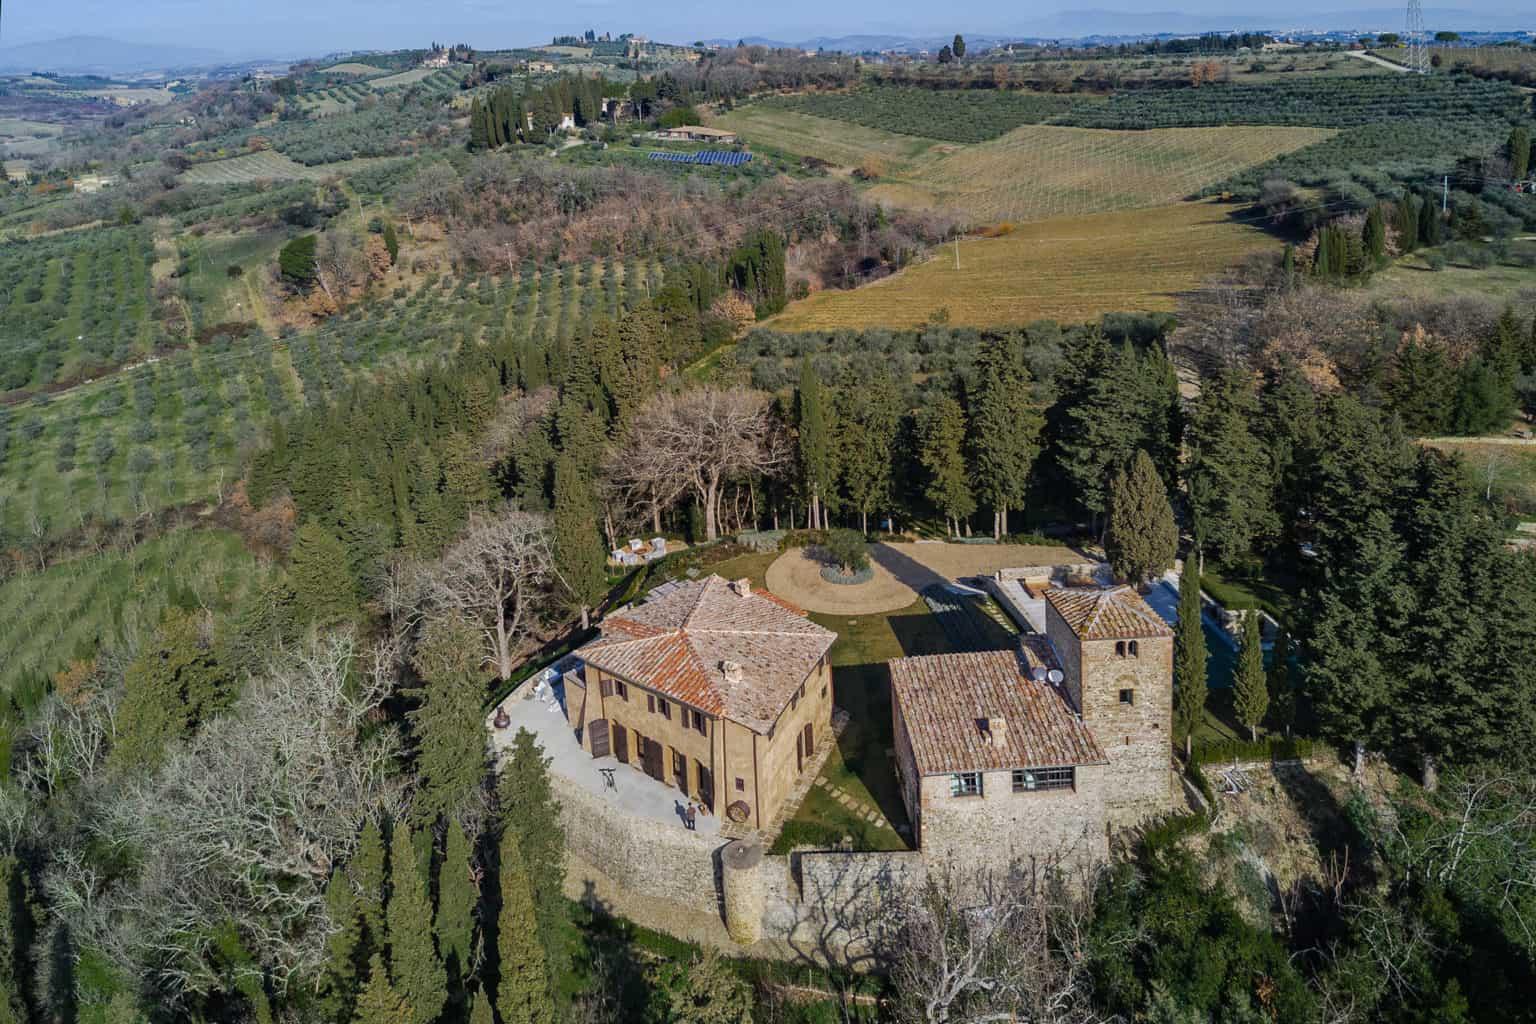 Tuscany: 5 new luxury villas to rent